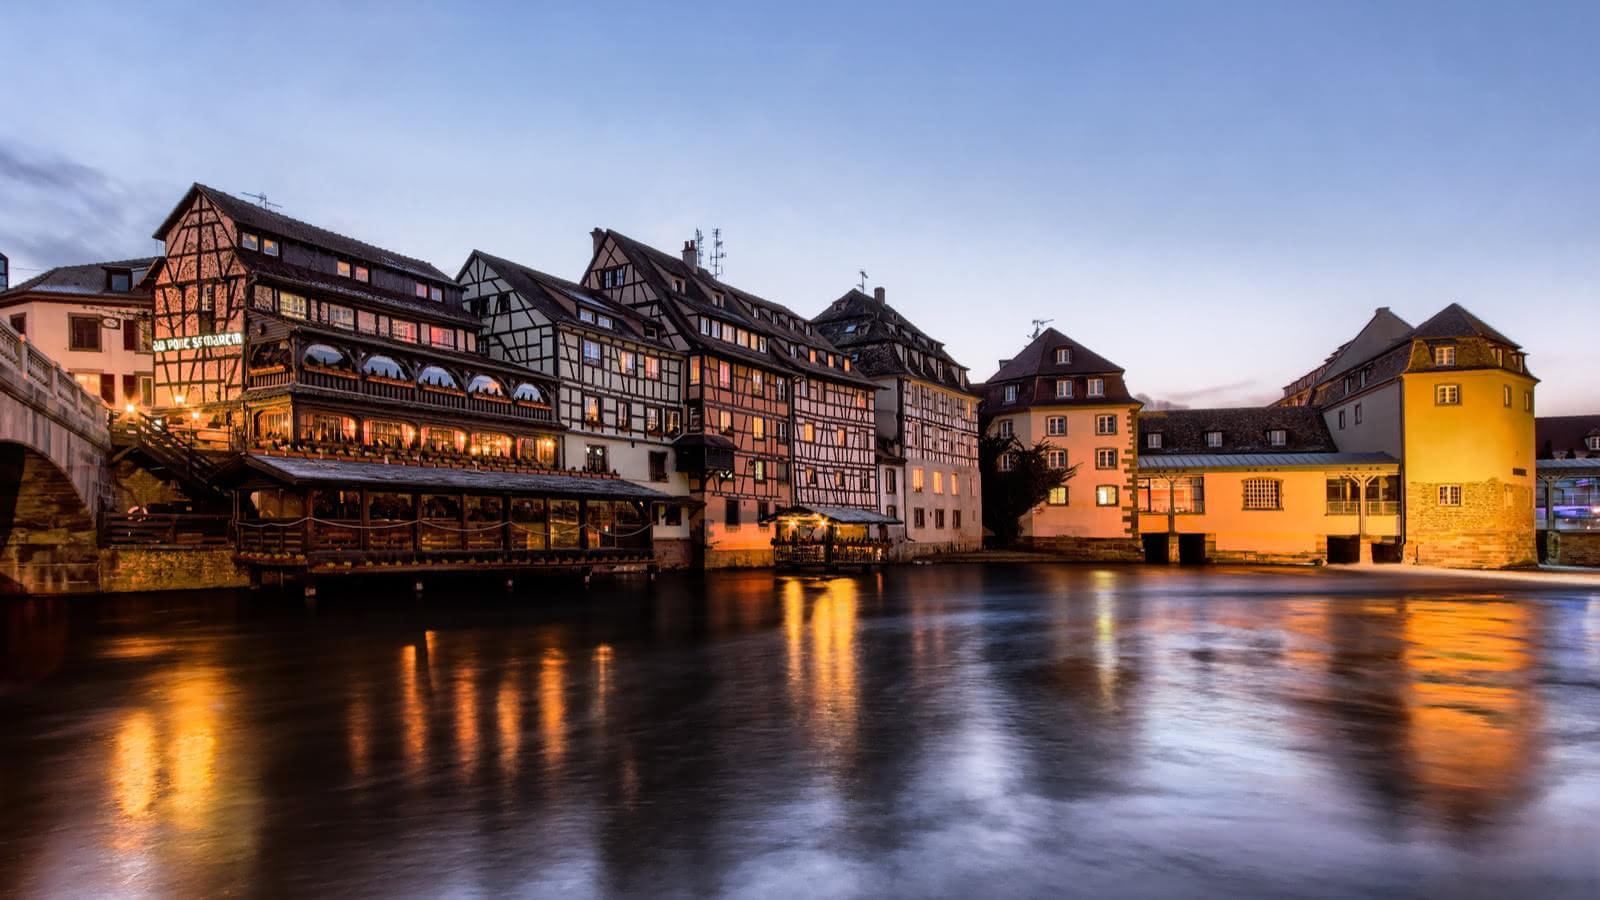 Maisons à colombages - Petite France - Strasbourg